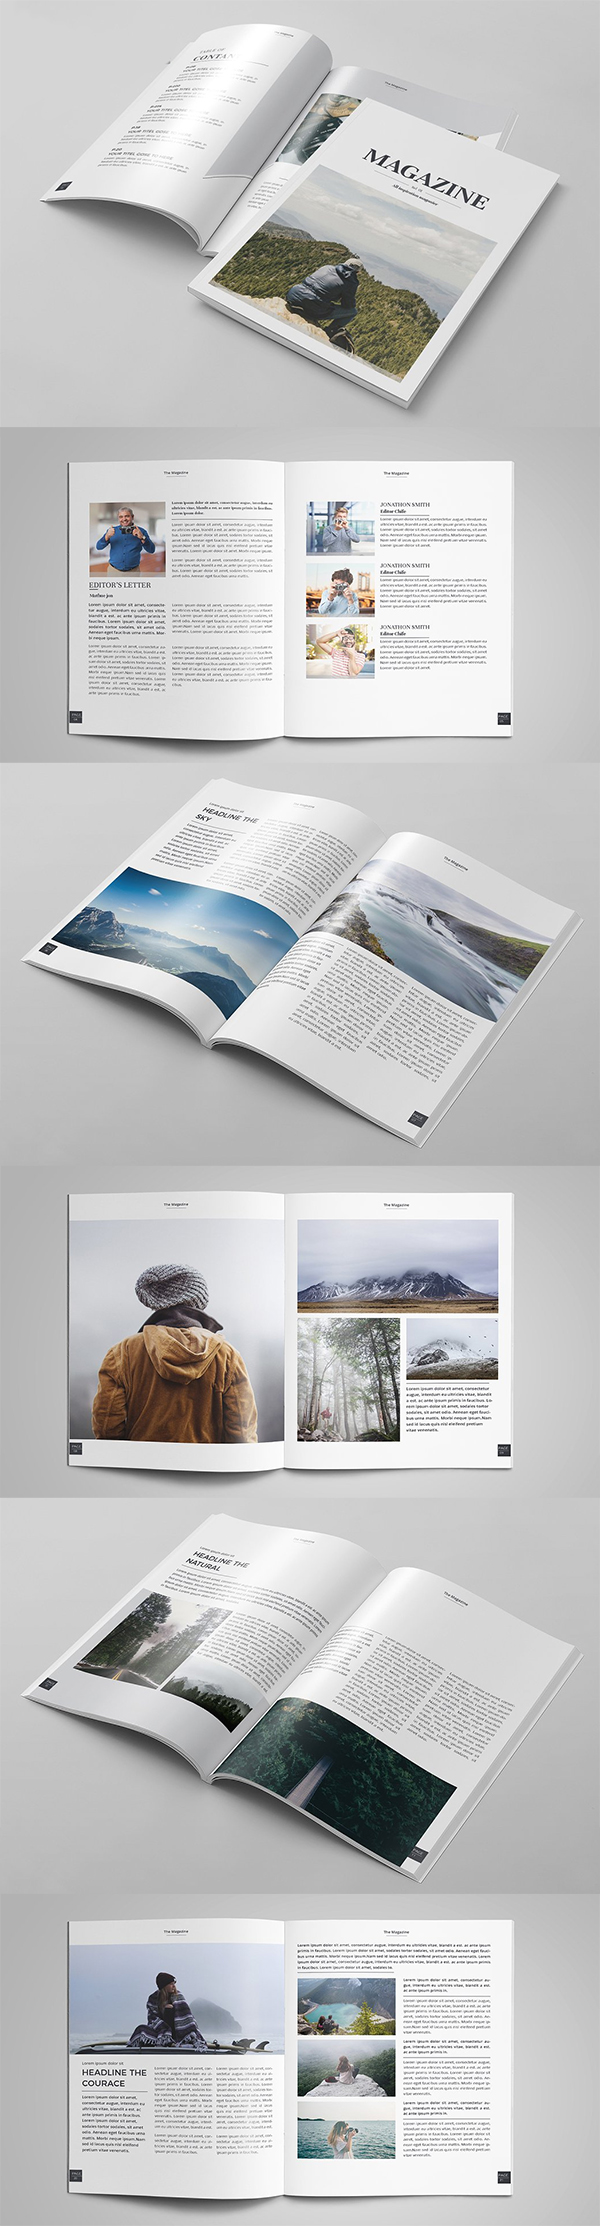 Awesome Magazine Brochure